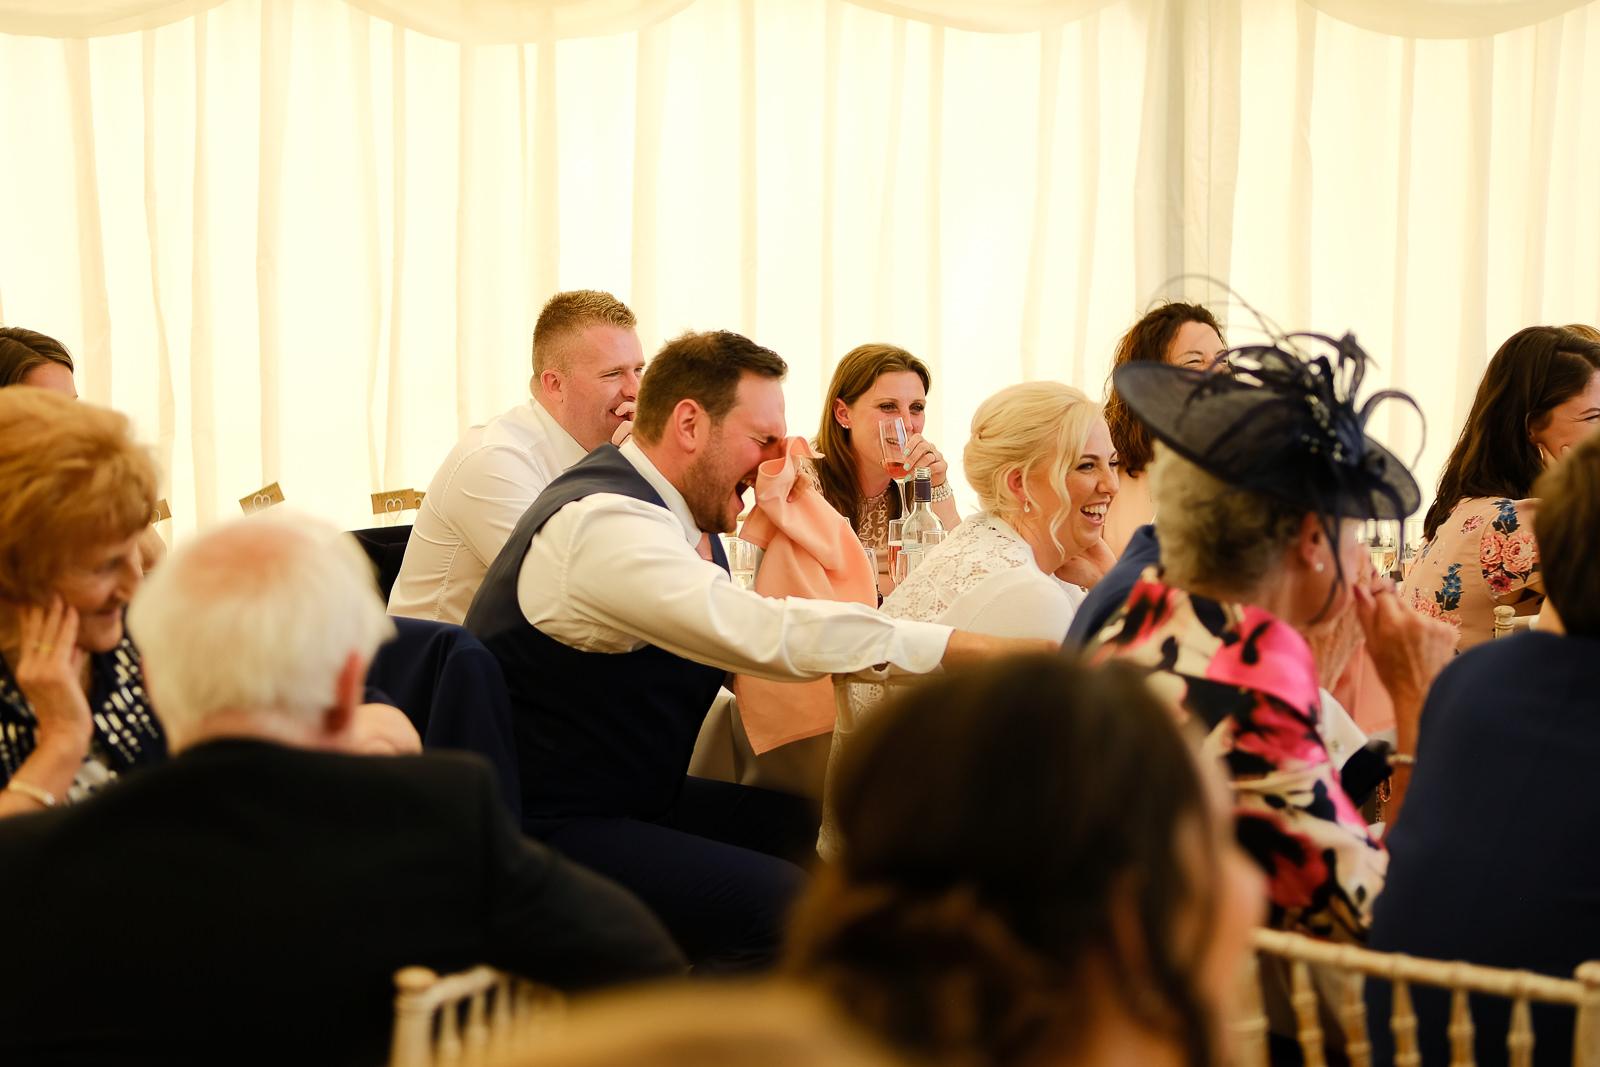 Roscarrock Farm wedding in Cornwall 063.jpg